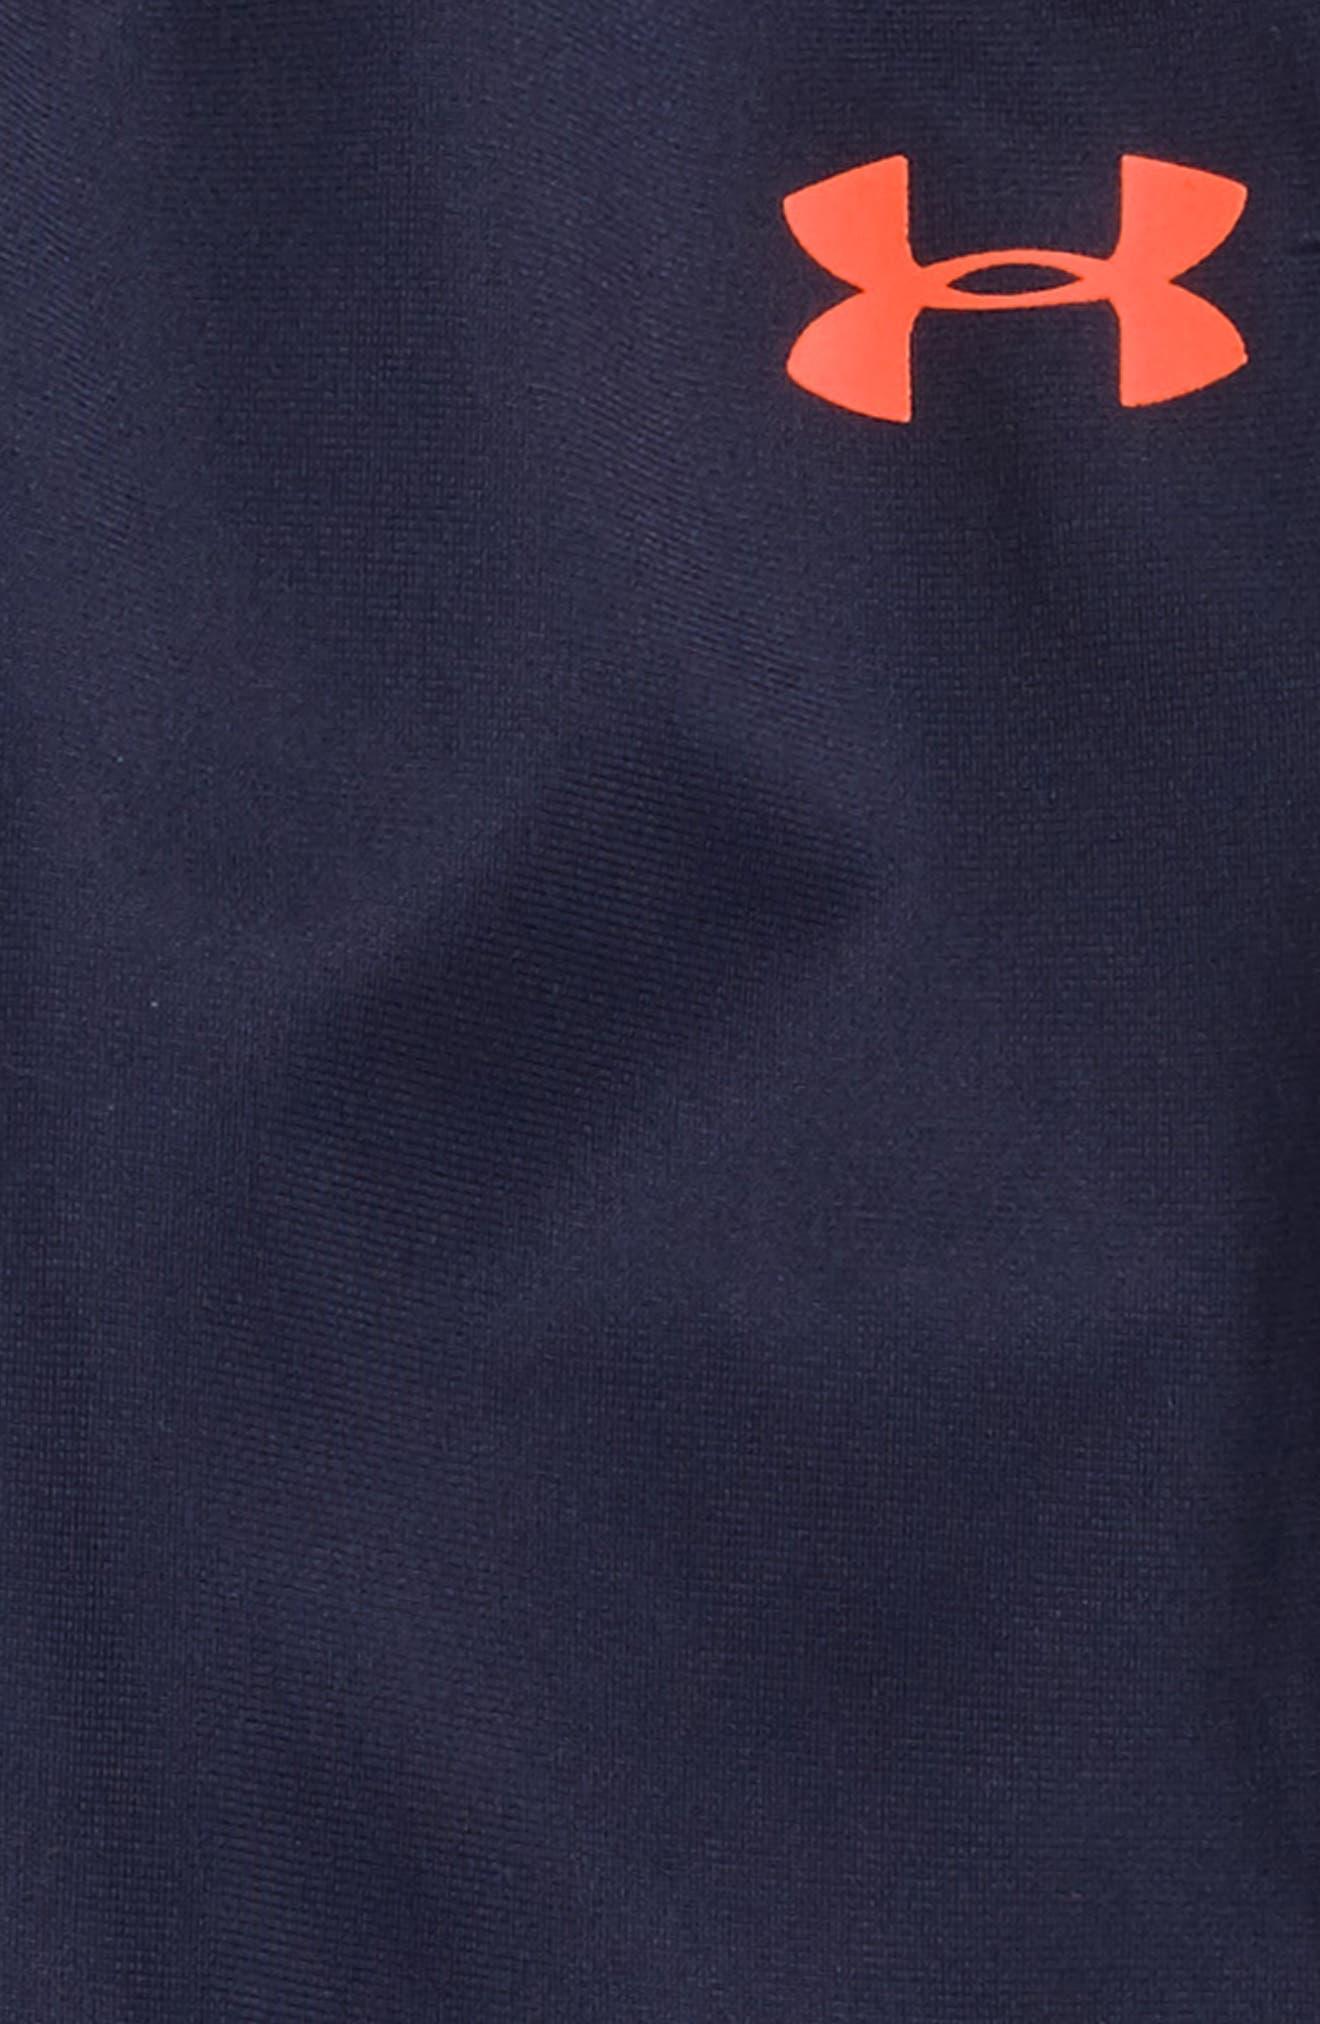 Alternate Image 2  - Under Armour Brawler 2.0 Pants (Toddler Boys & Little Boys)